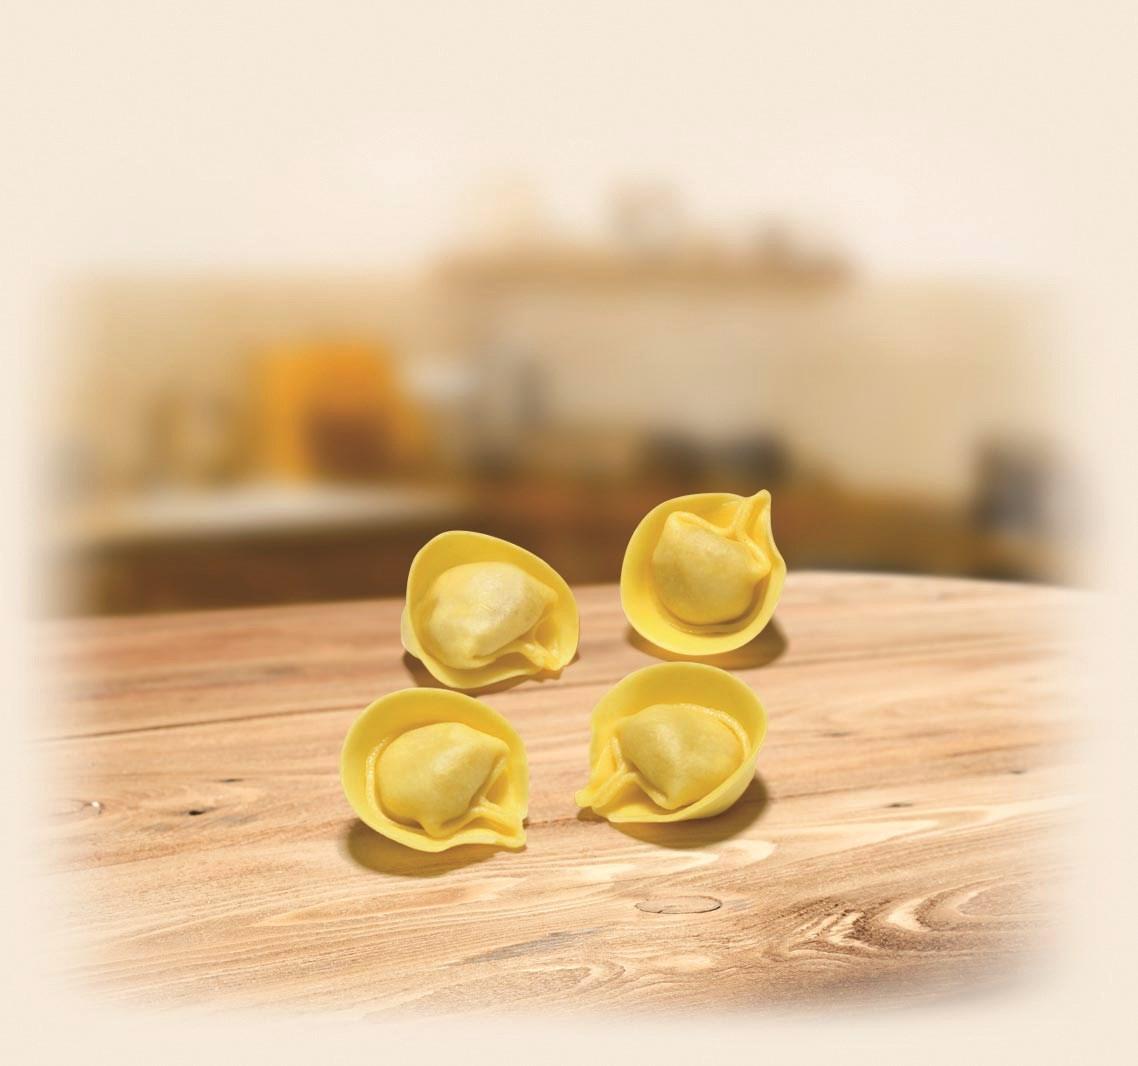 Productafbeelding Tortellini al manzo brasato (gestoofd rundvlees) 1000 g